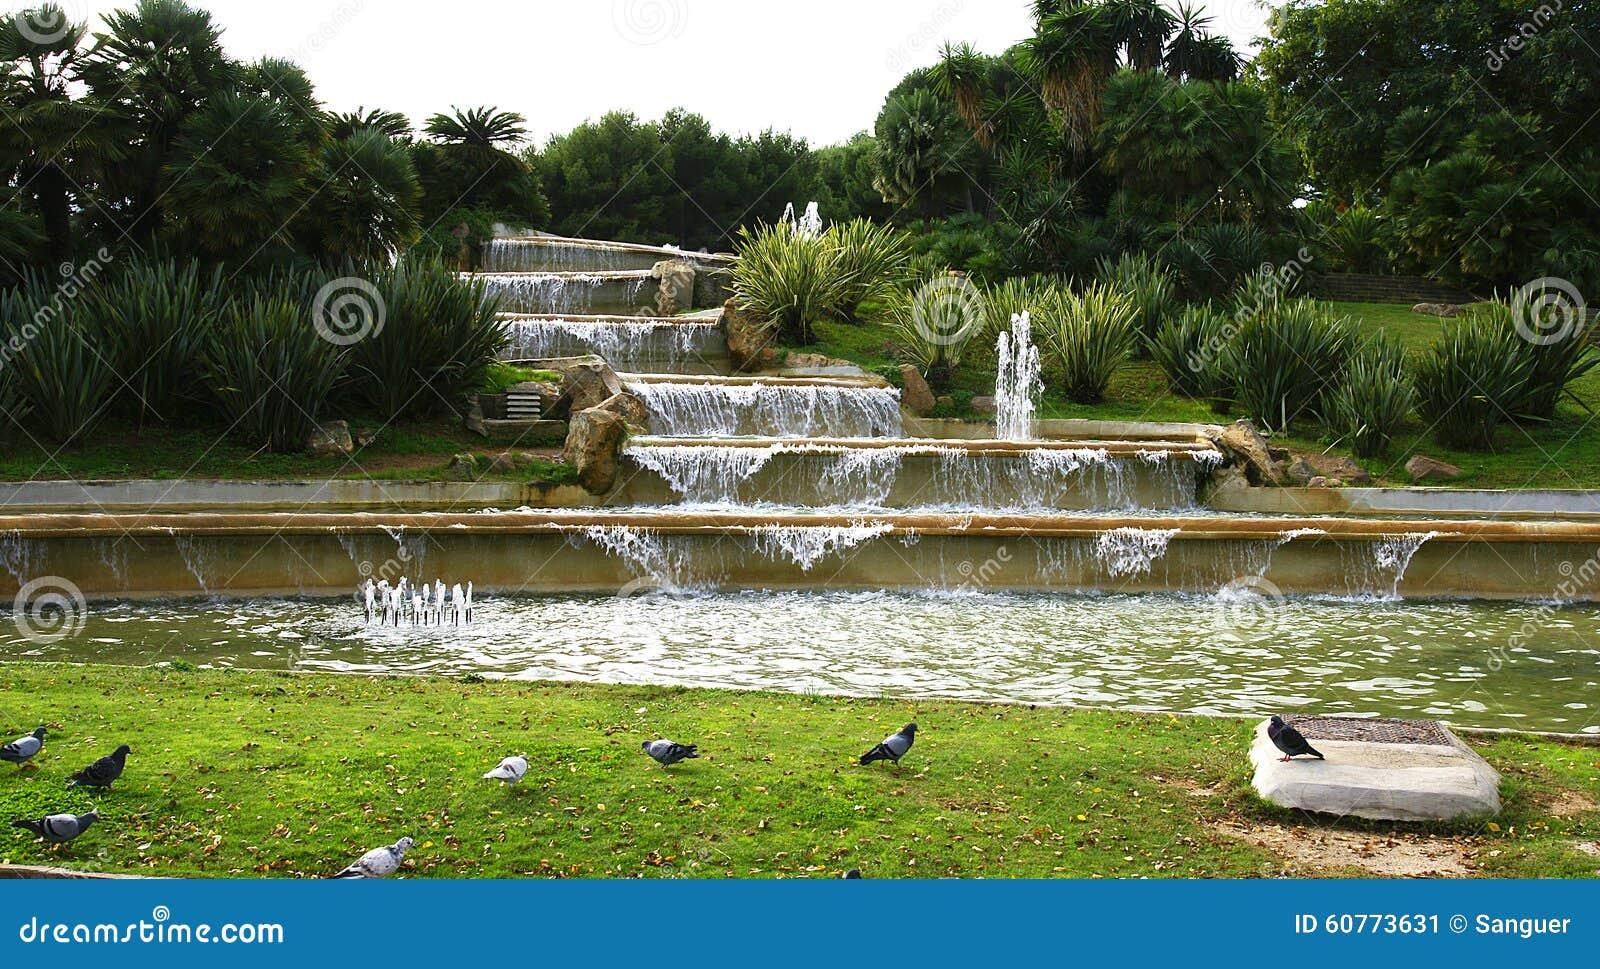 Fontane A Cascata Da Giardino: Due modi per costruire una fontana ...